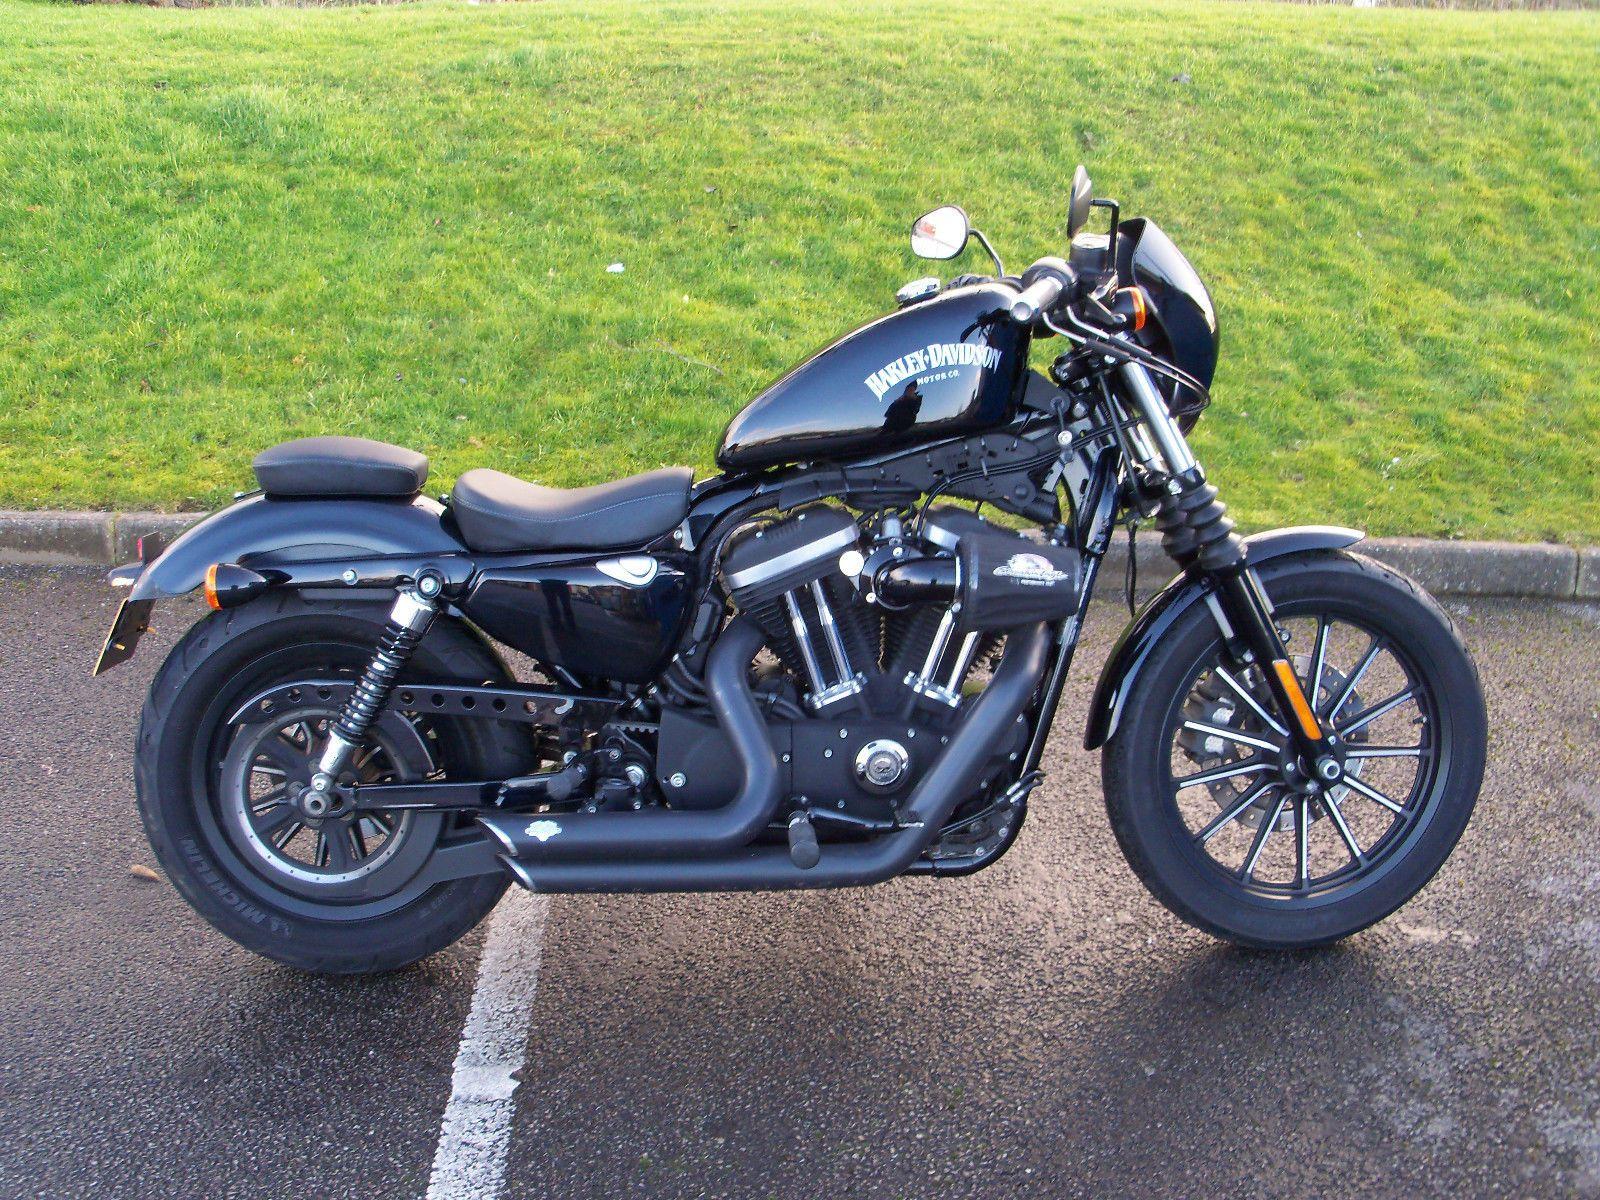 harley davidson sportster iron - 1200 conversion | motorcycle